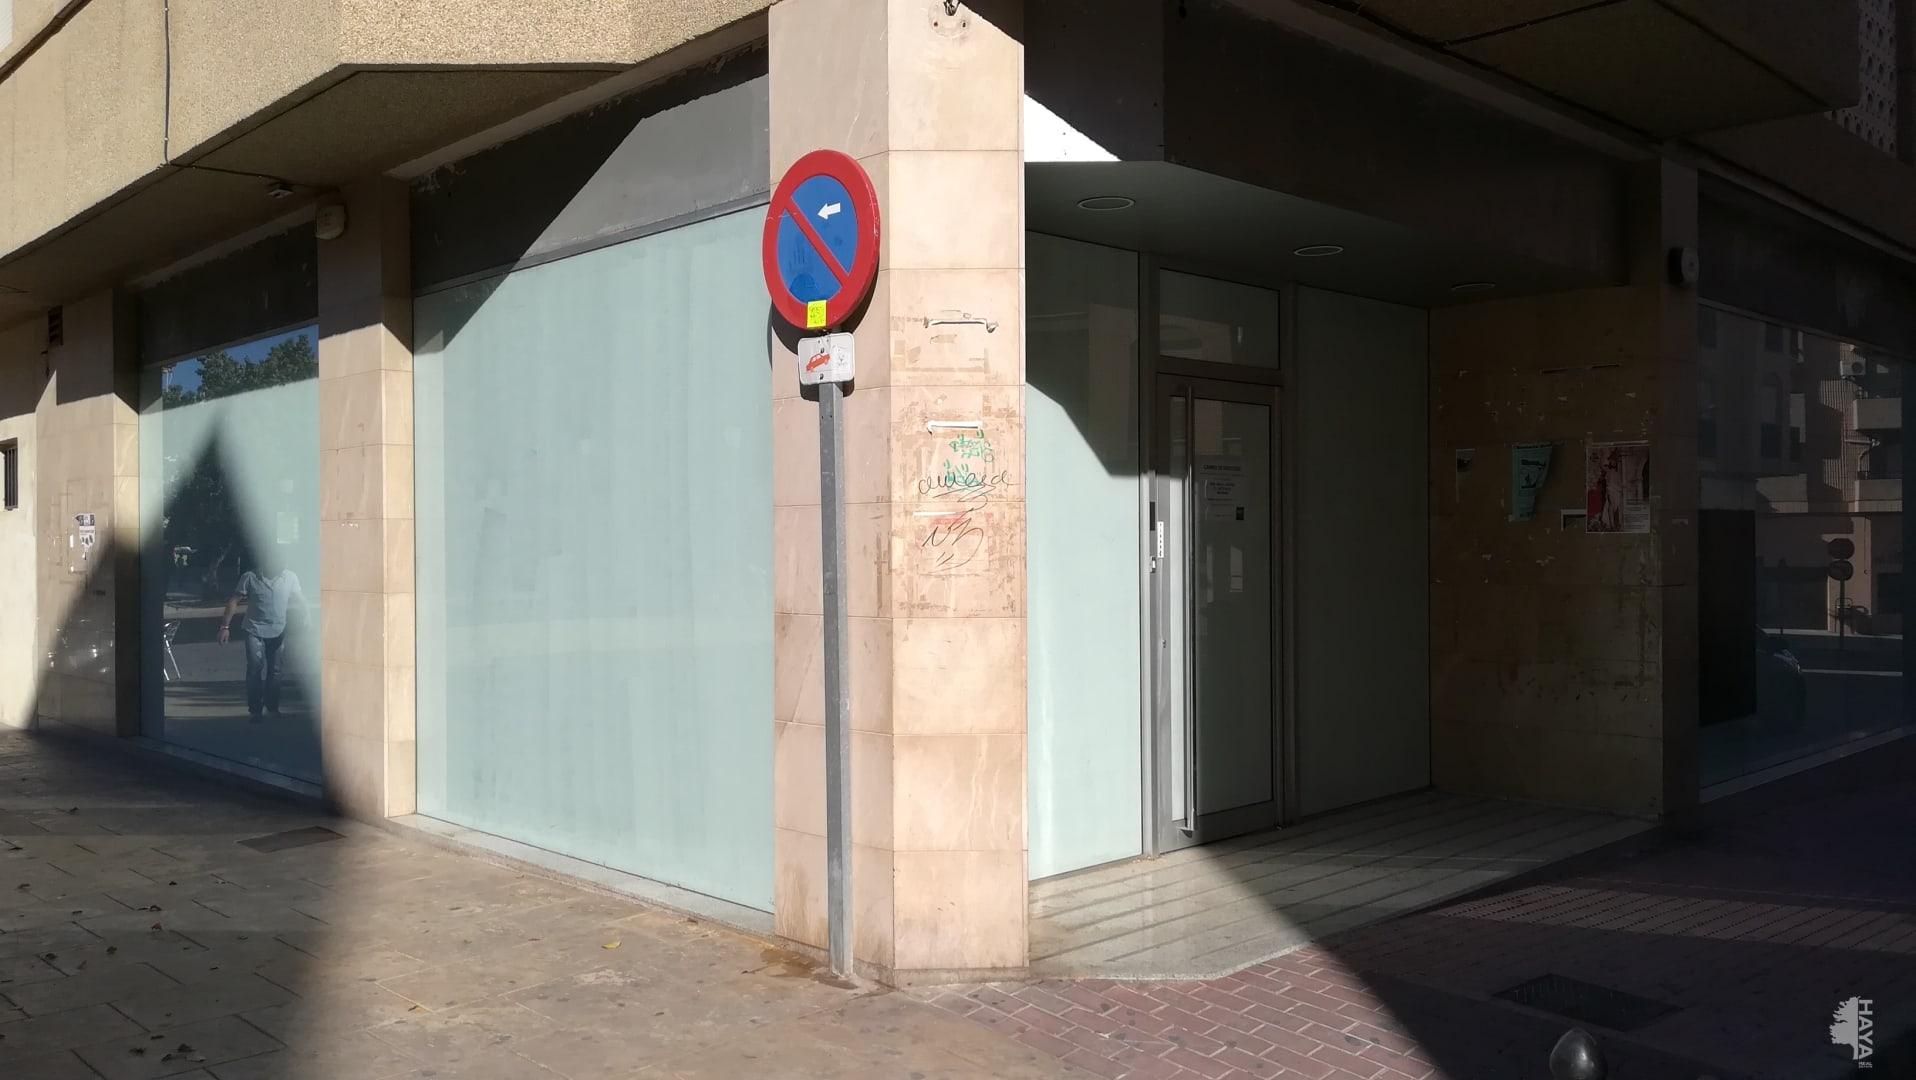 Local en venta en Mula, Murcia, Calle Velazquez, 263.190 €, 224 m2